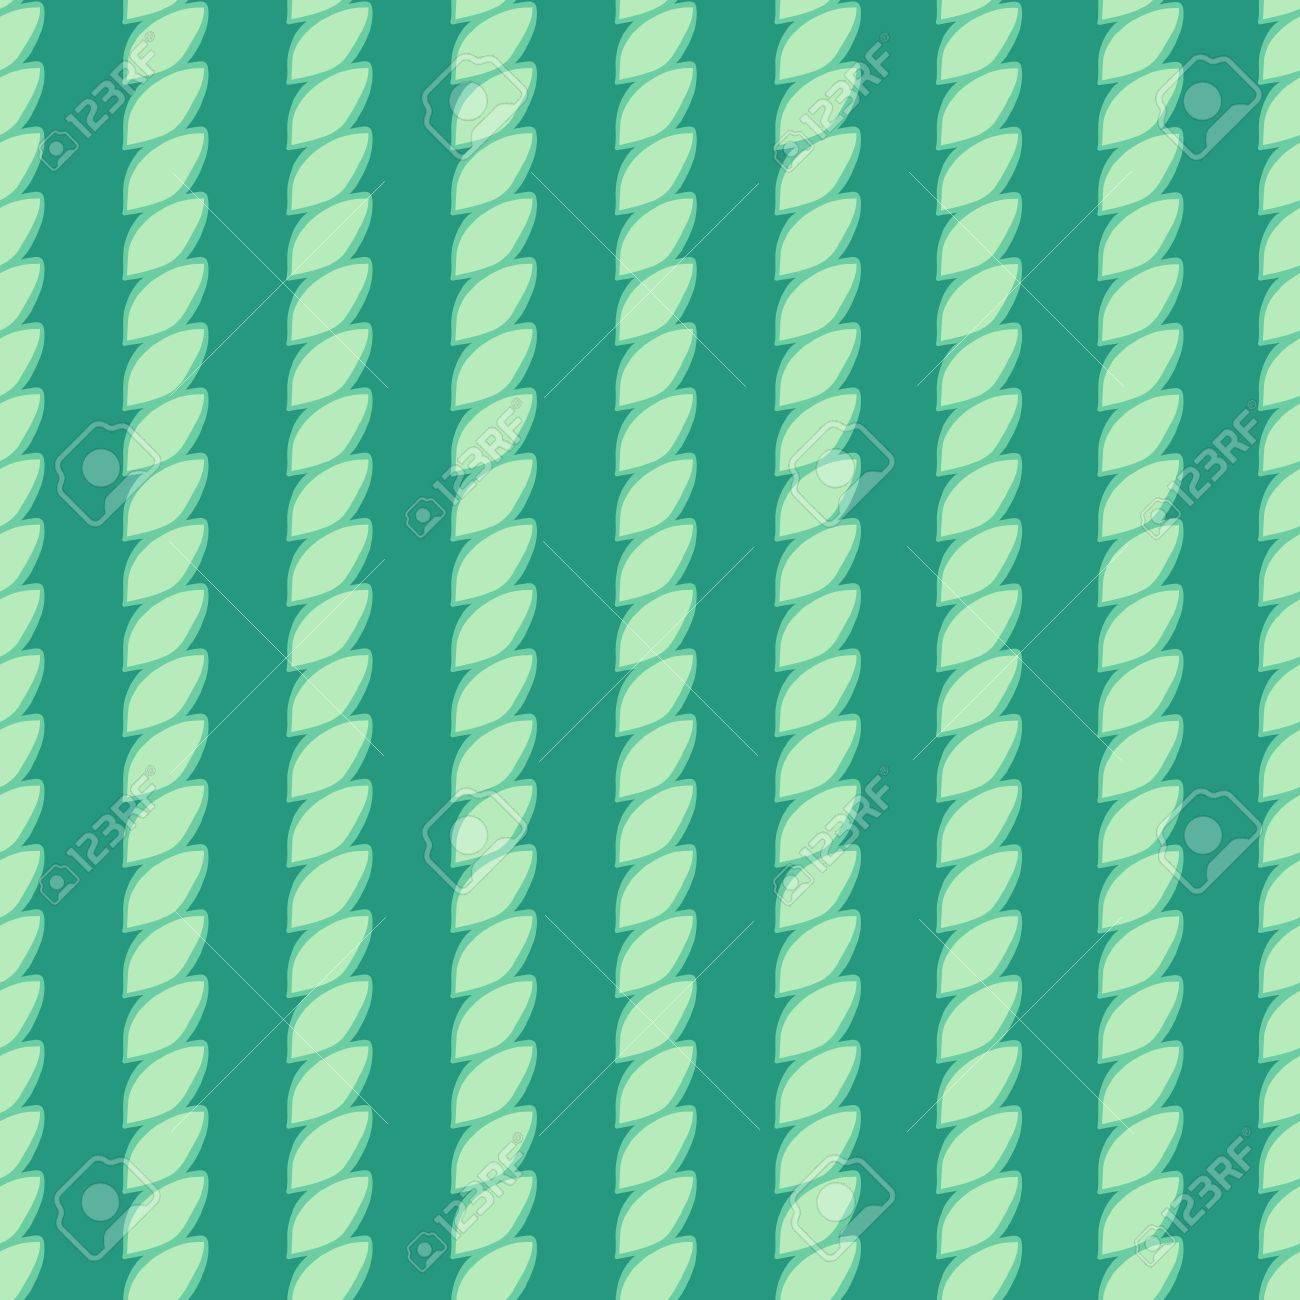 Abstract Seamless Pattern. Ressemble à Tricot Lin, Papier Peint ...